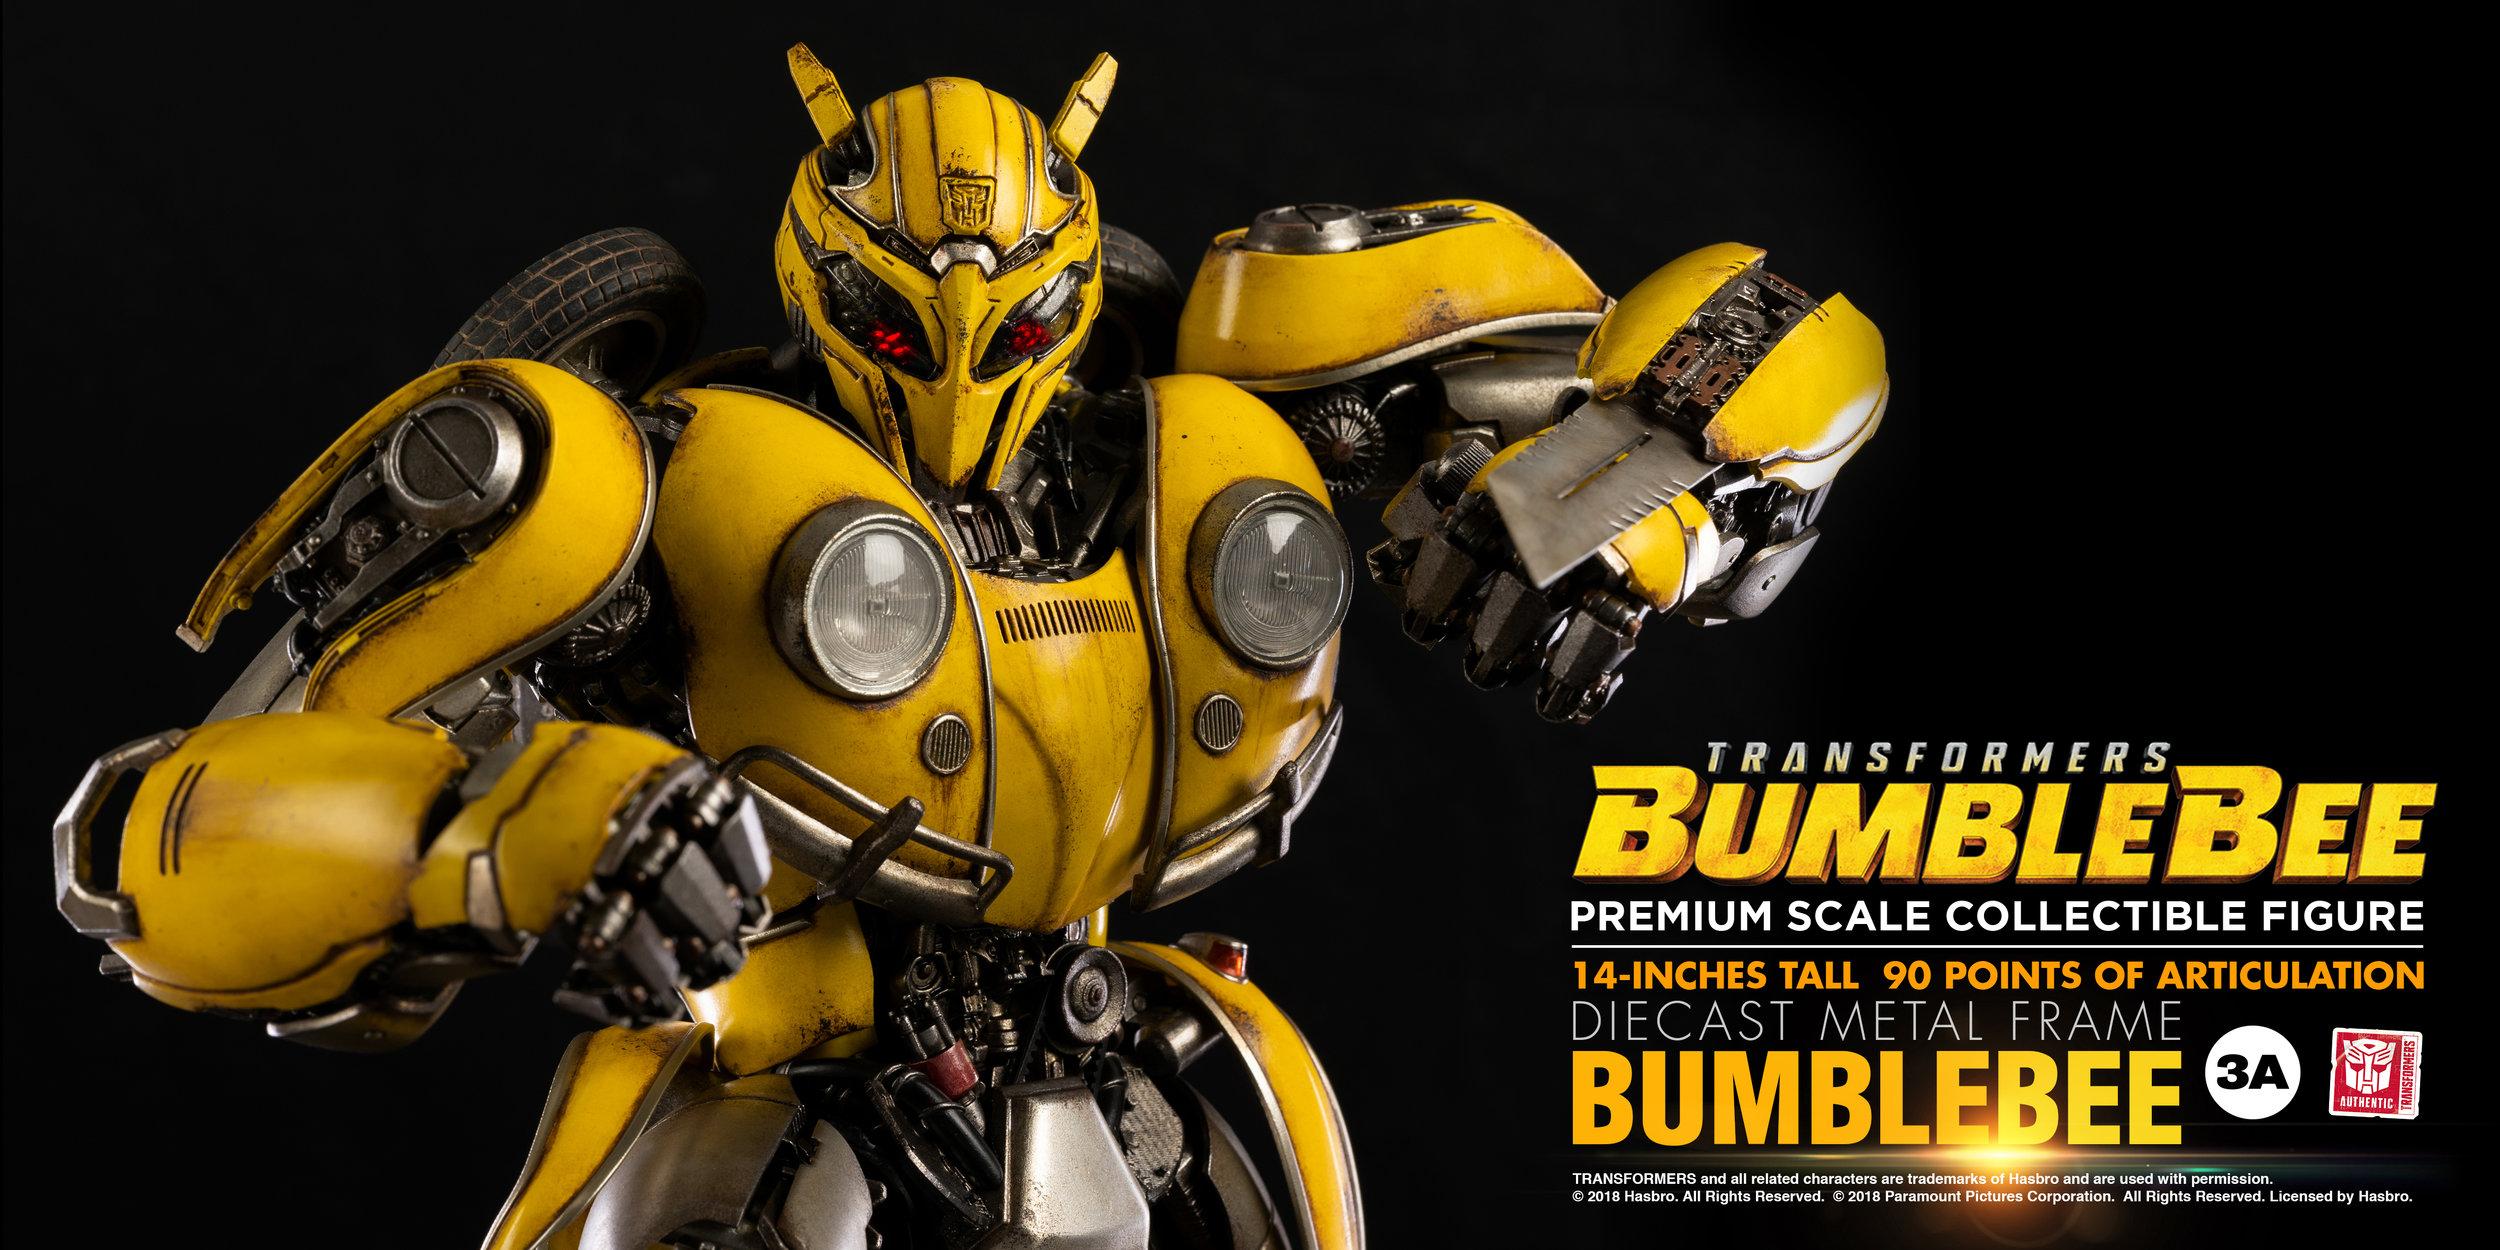 Bumblebee_ENG_PM_WIDE_006.jpg